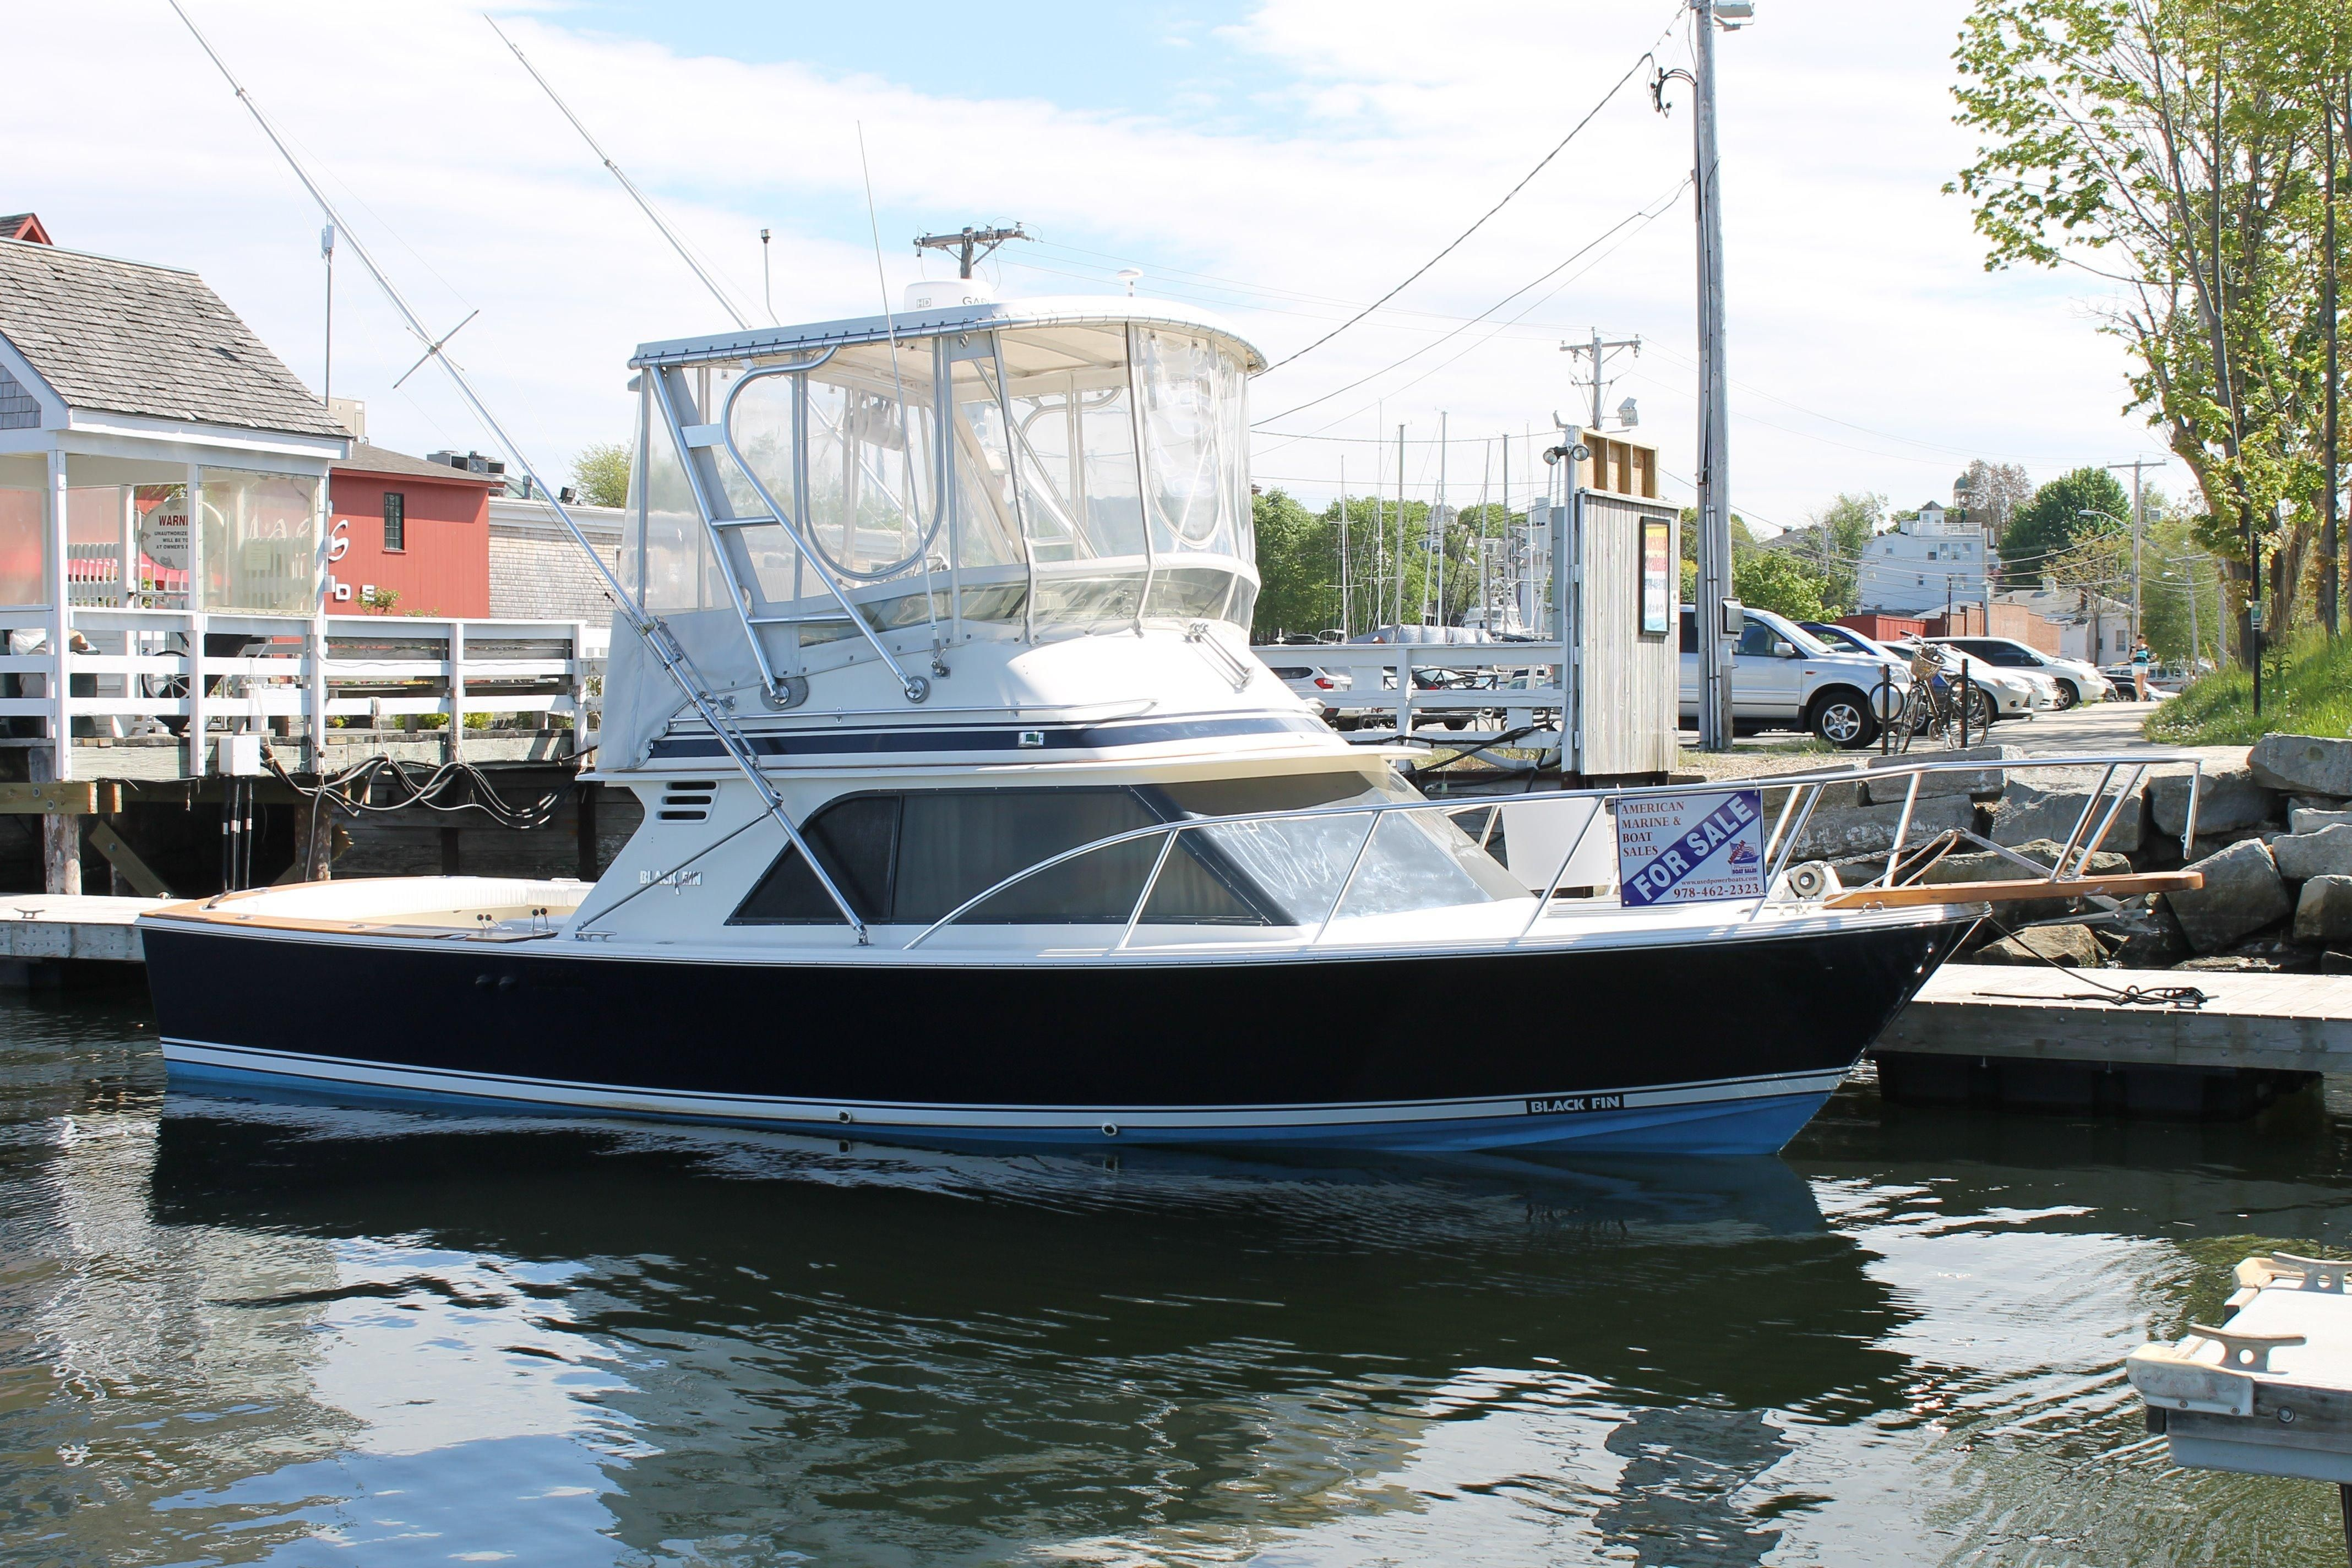 Carver Boats For Sale >> 1988 Blackfin 32 Flybridge Power Boat For Sale - www ...